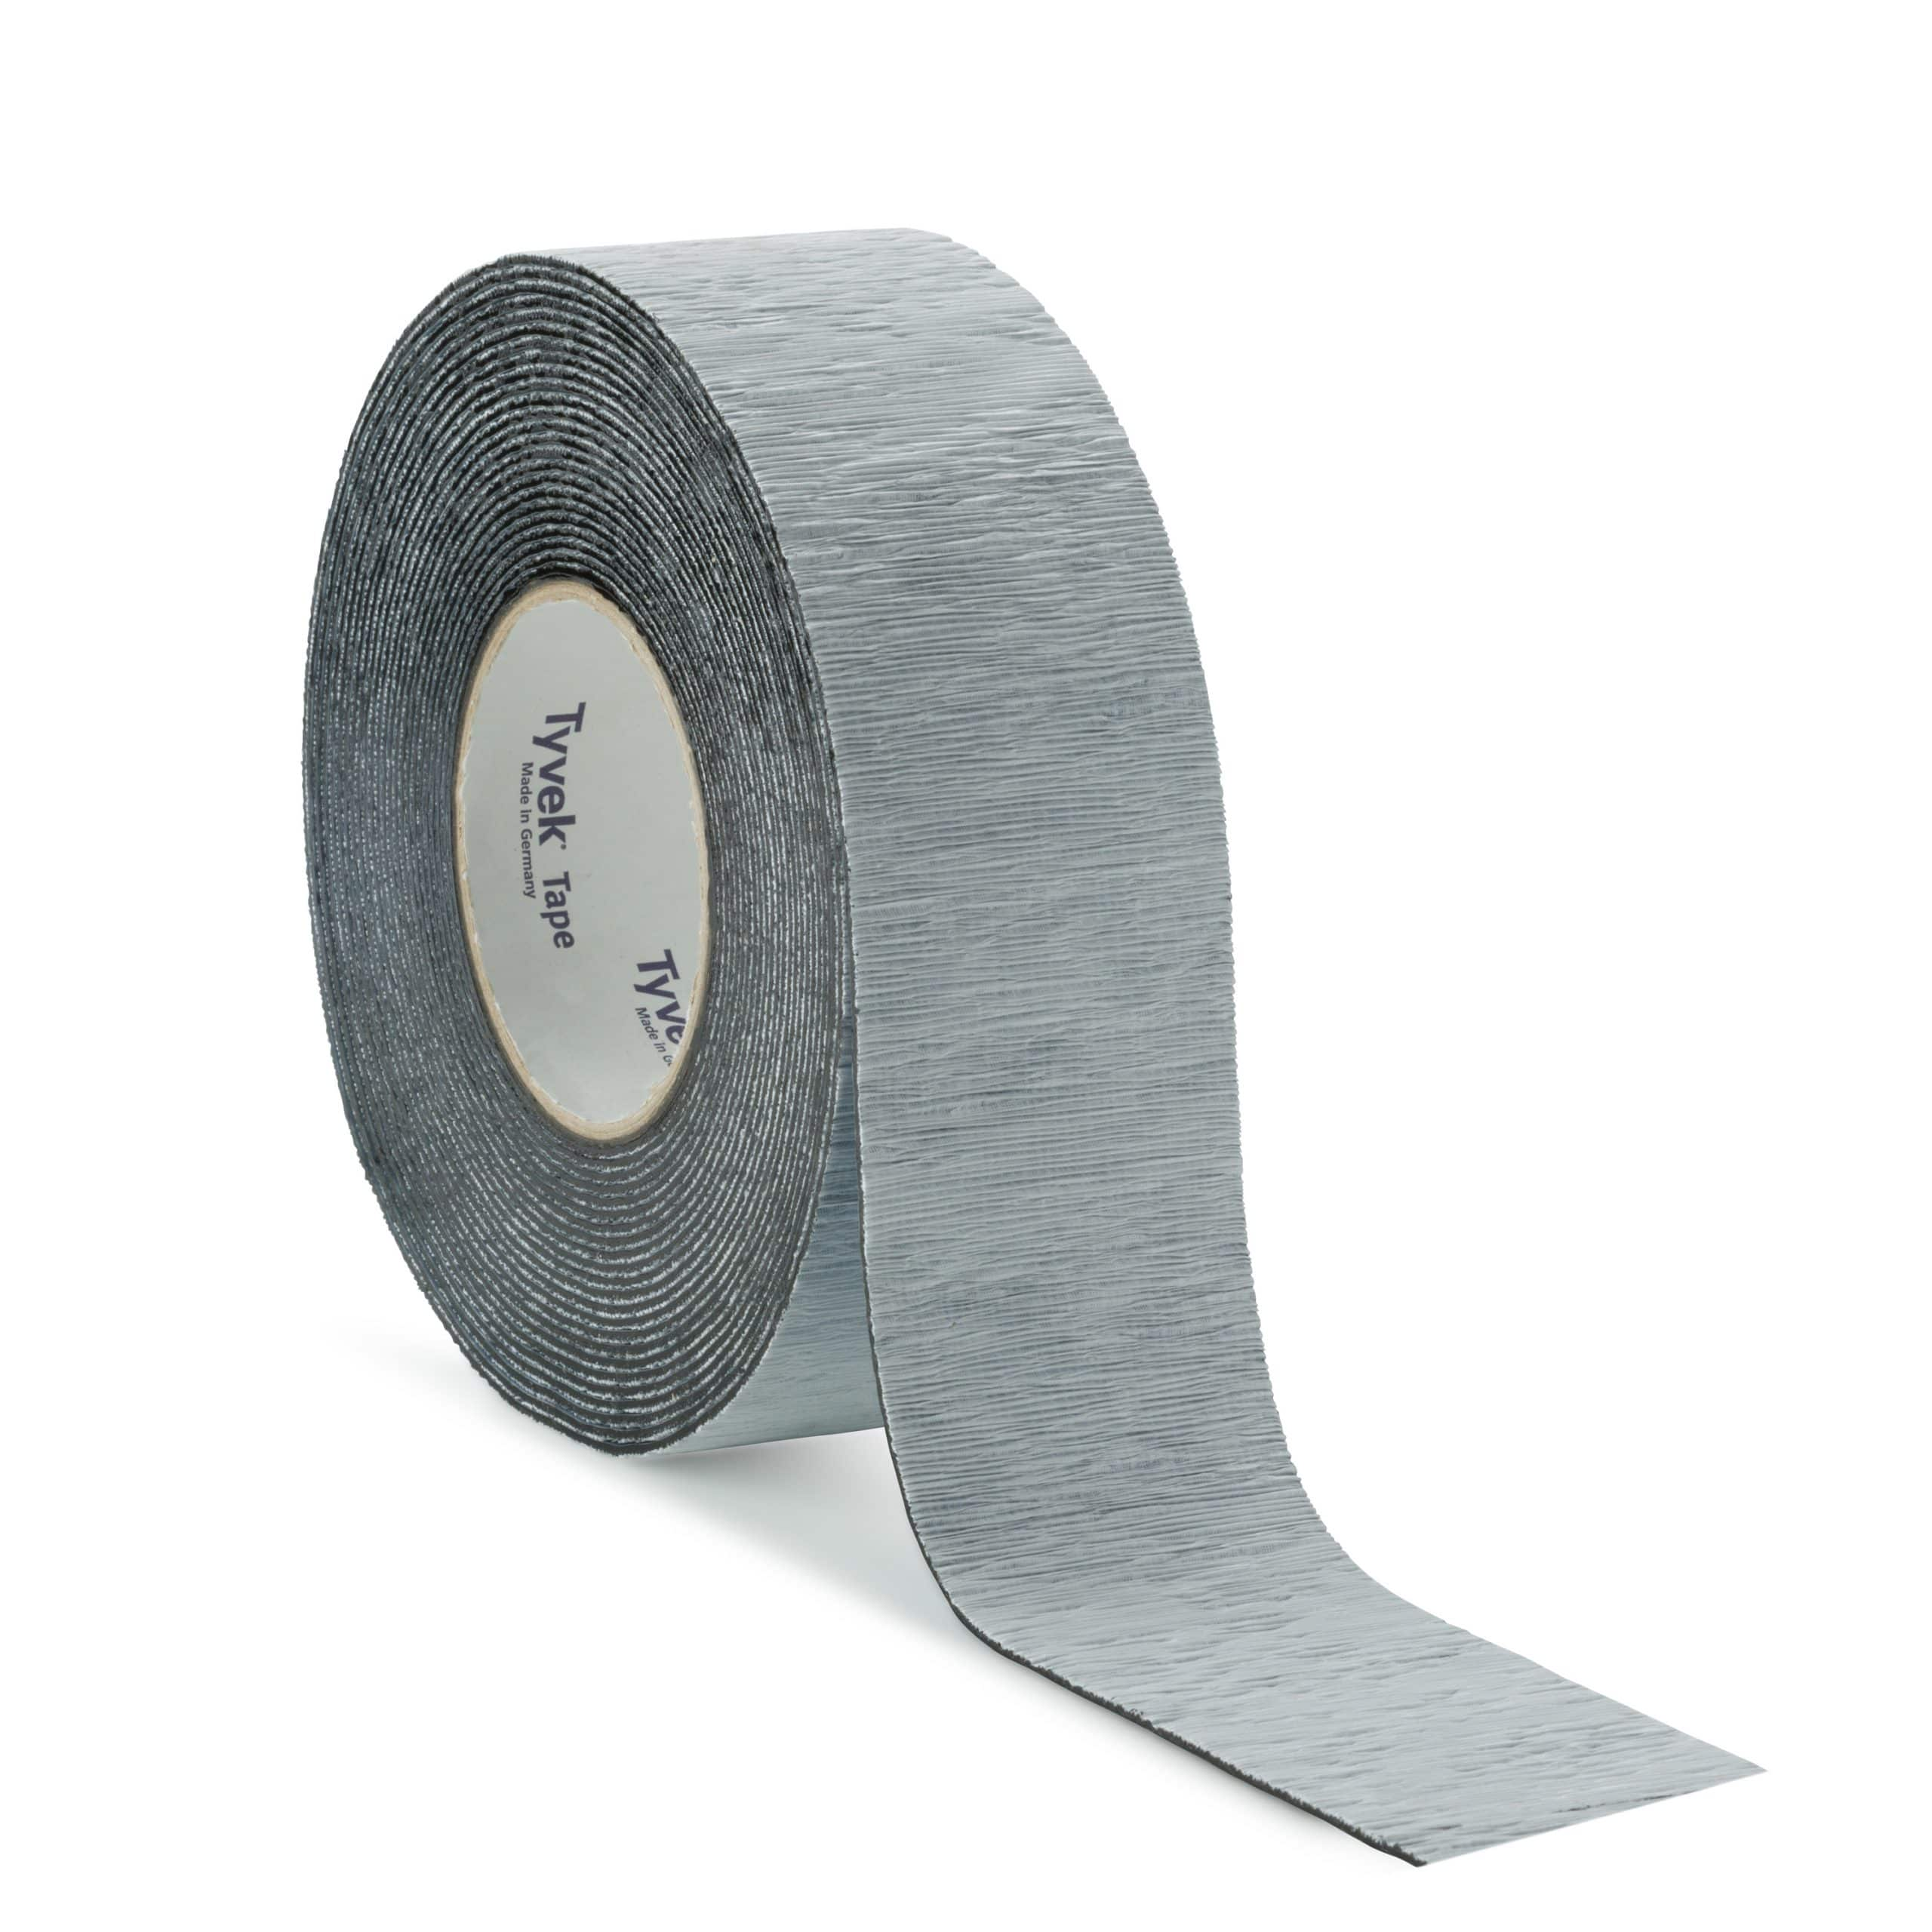 Tyvek Flexwrap tape